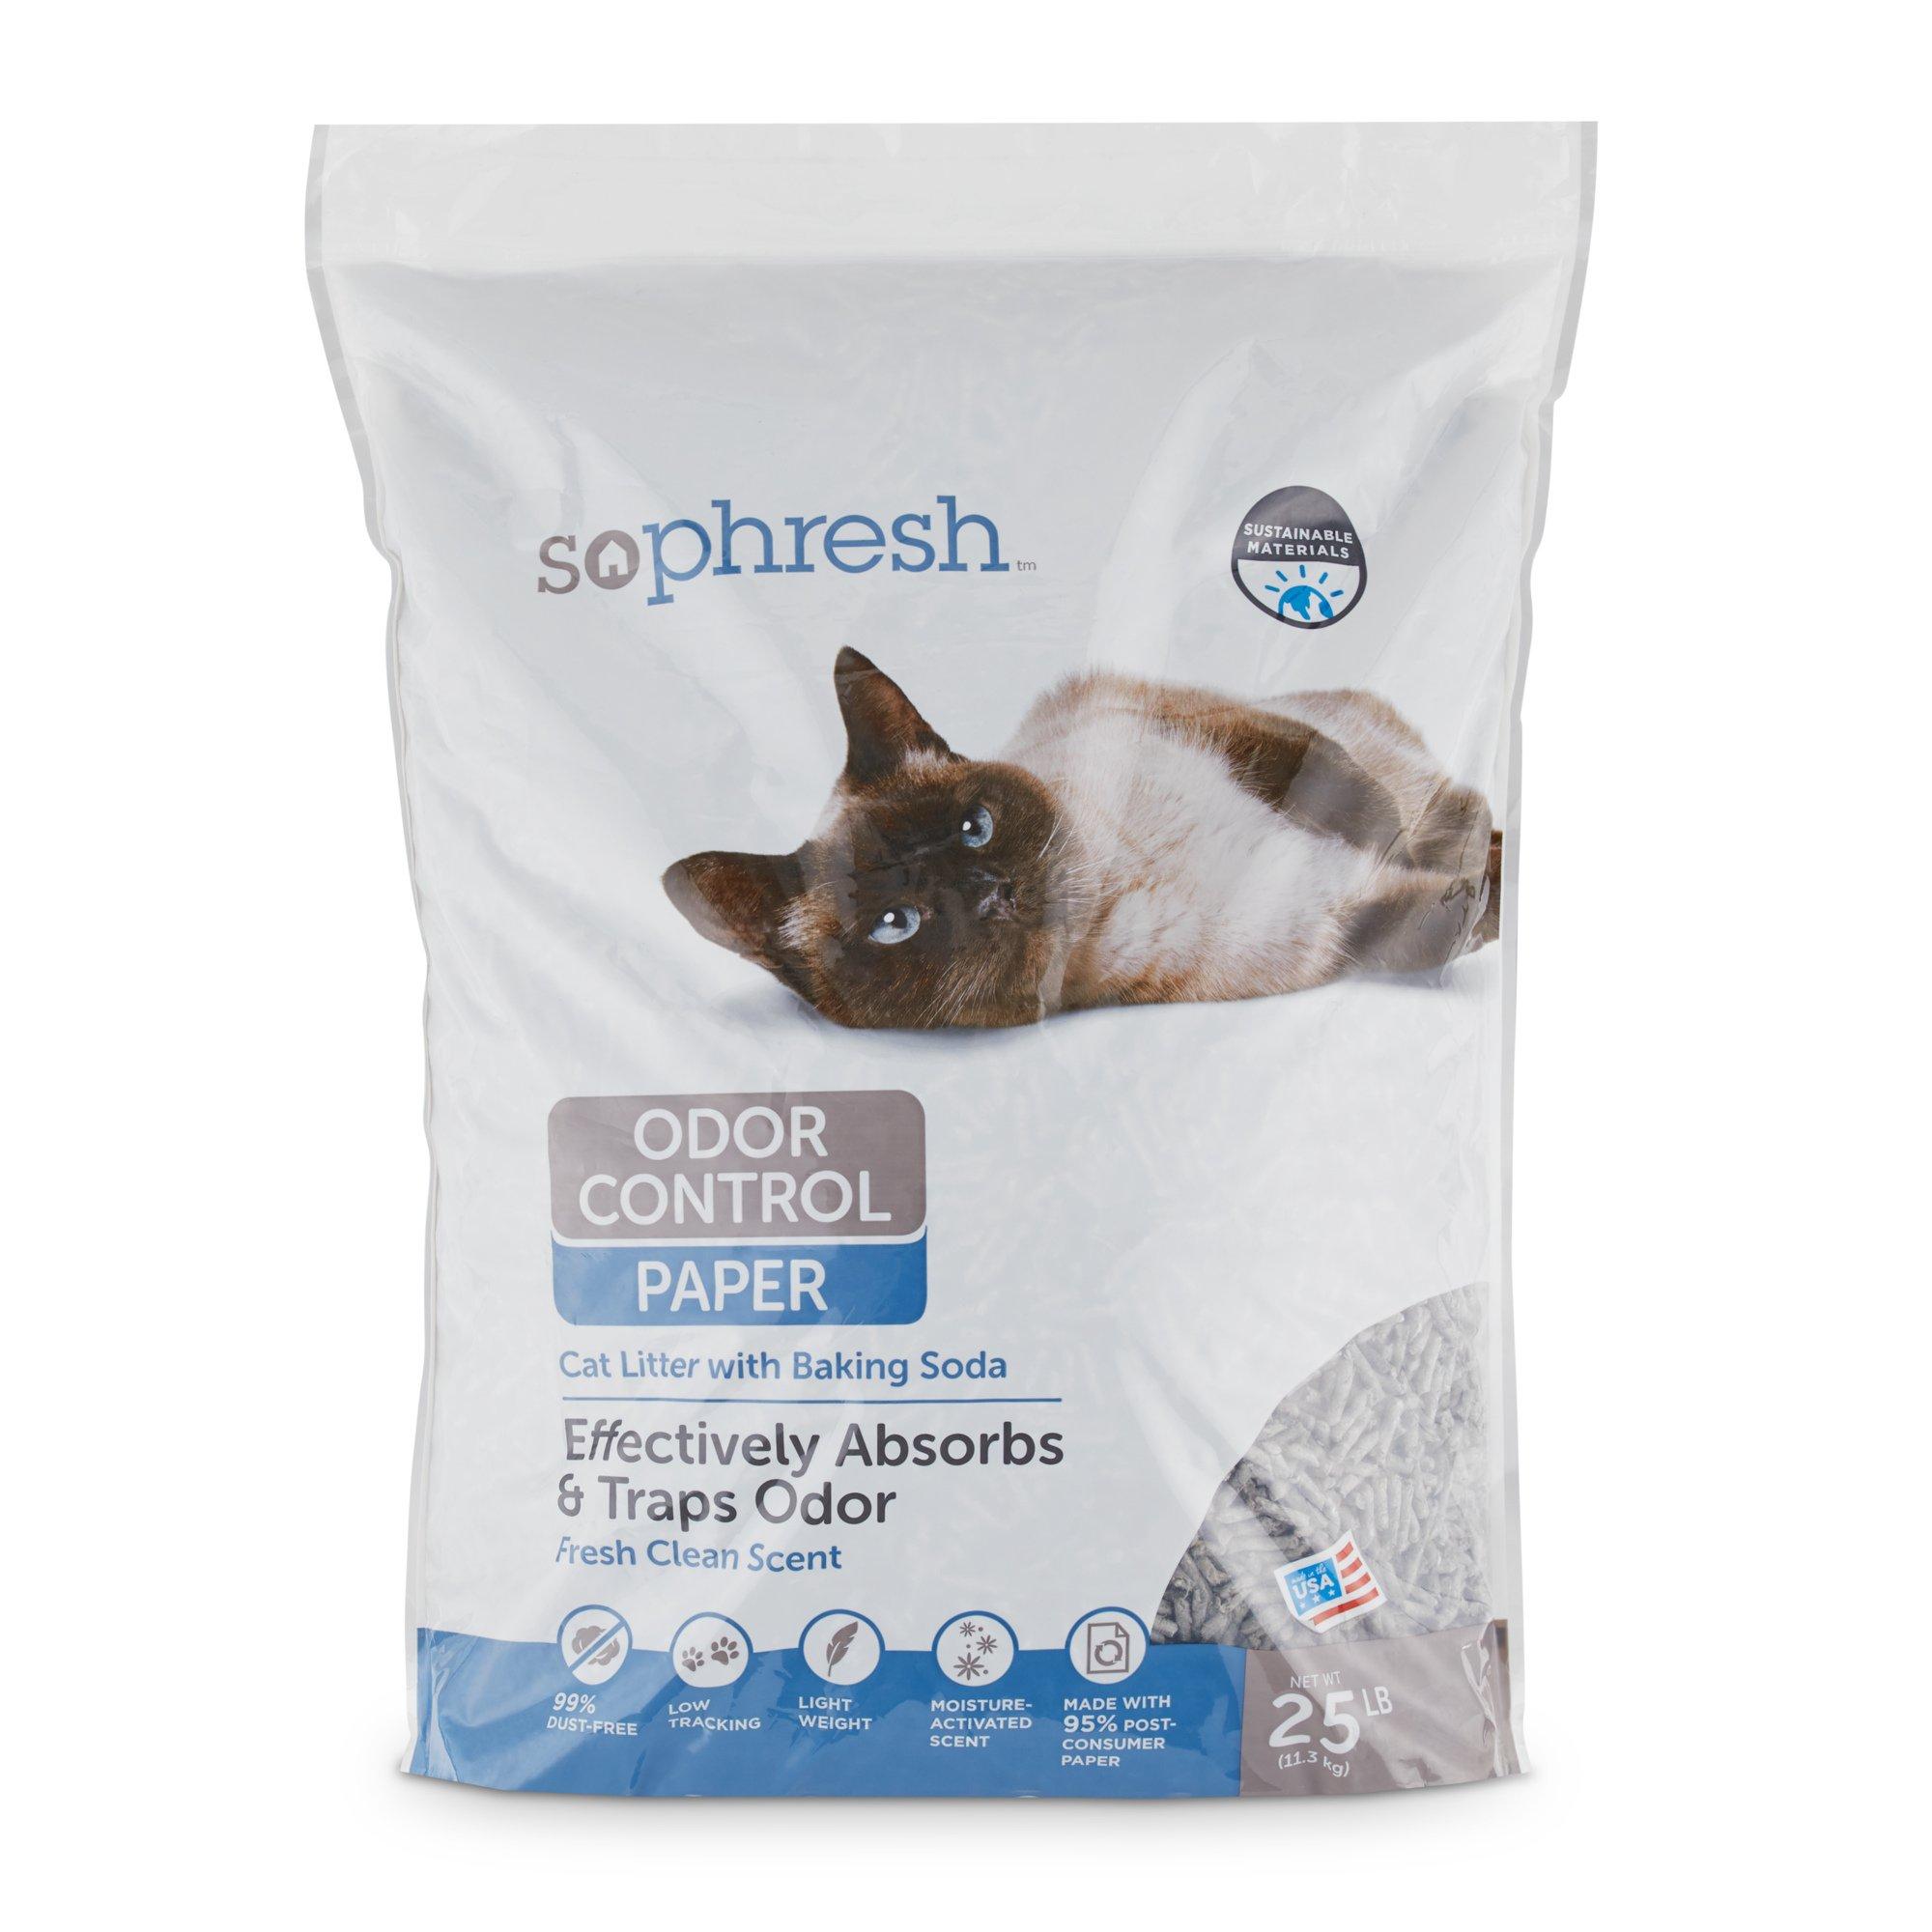 So Phresh Odor Control Paper Pellet Cat Litter